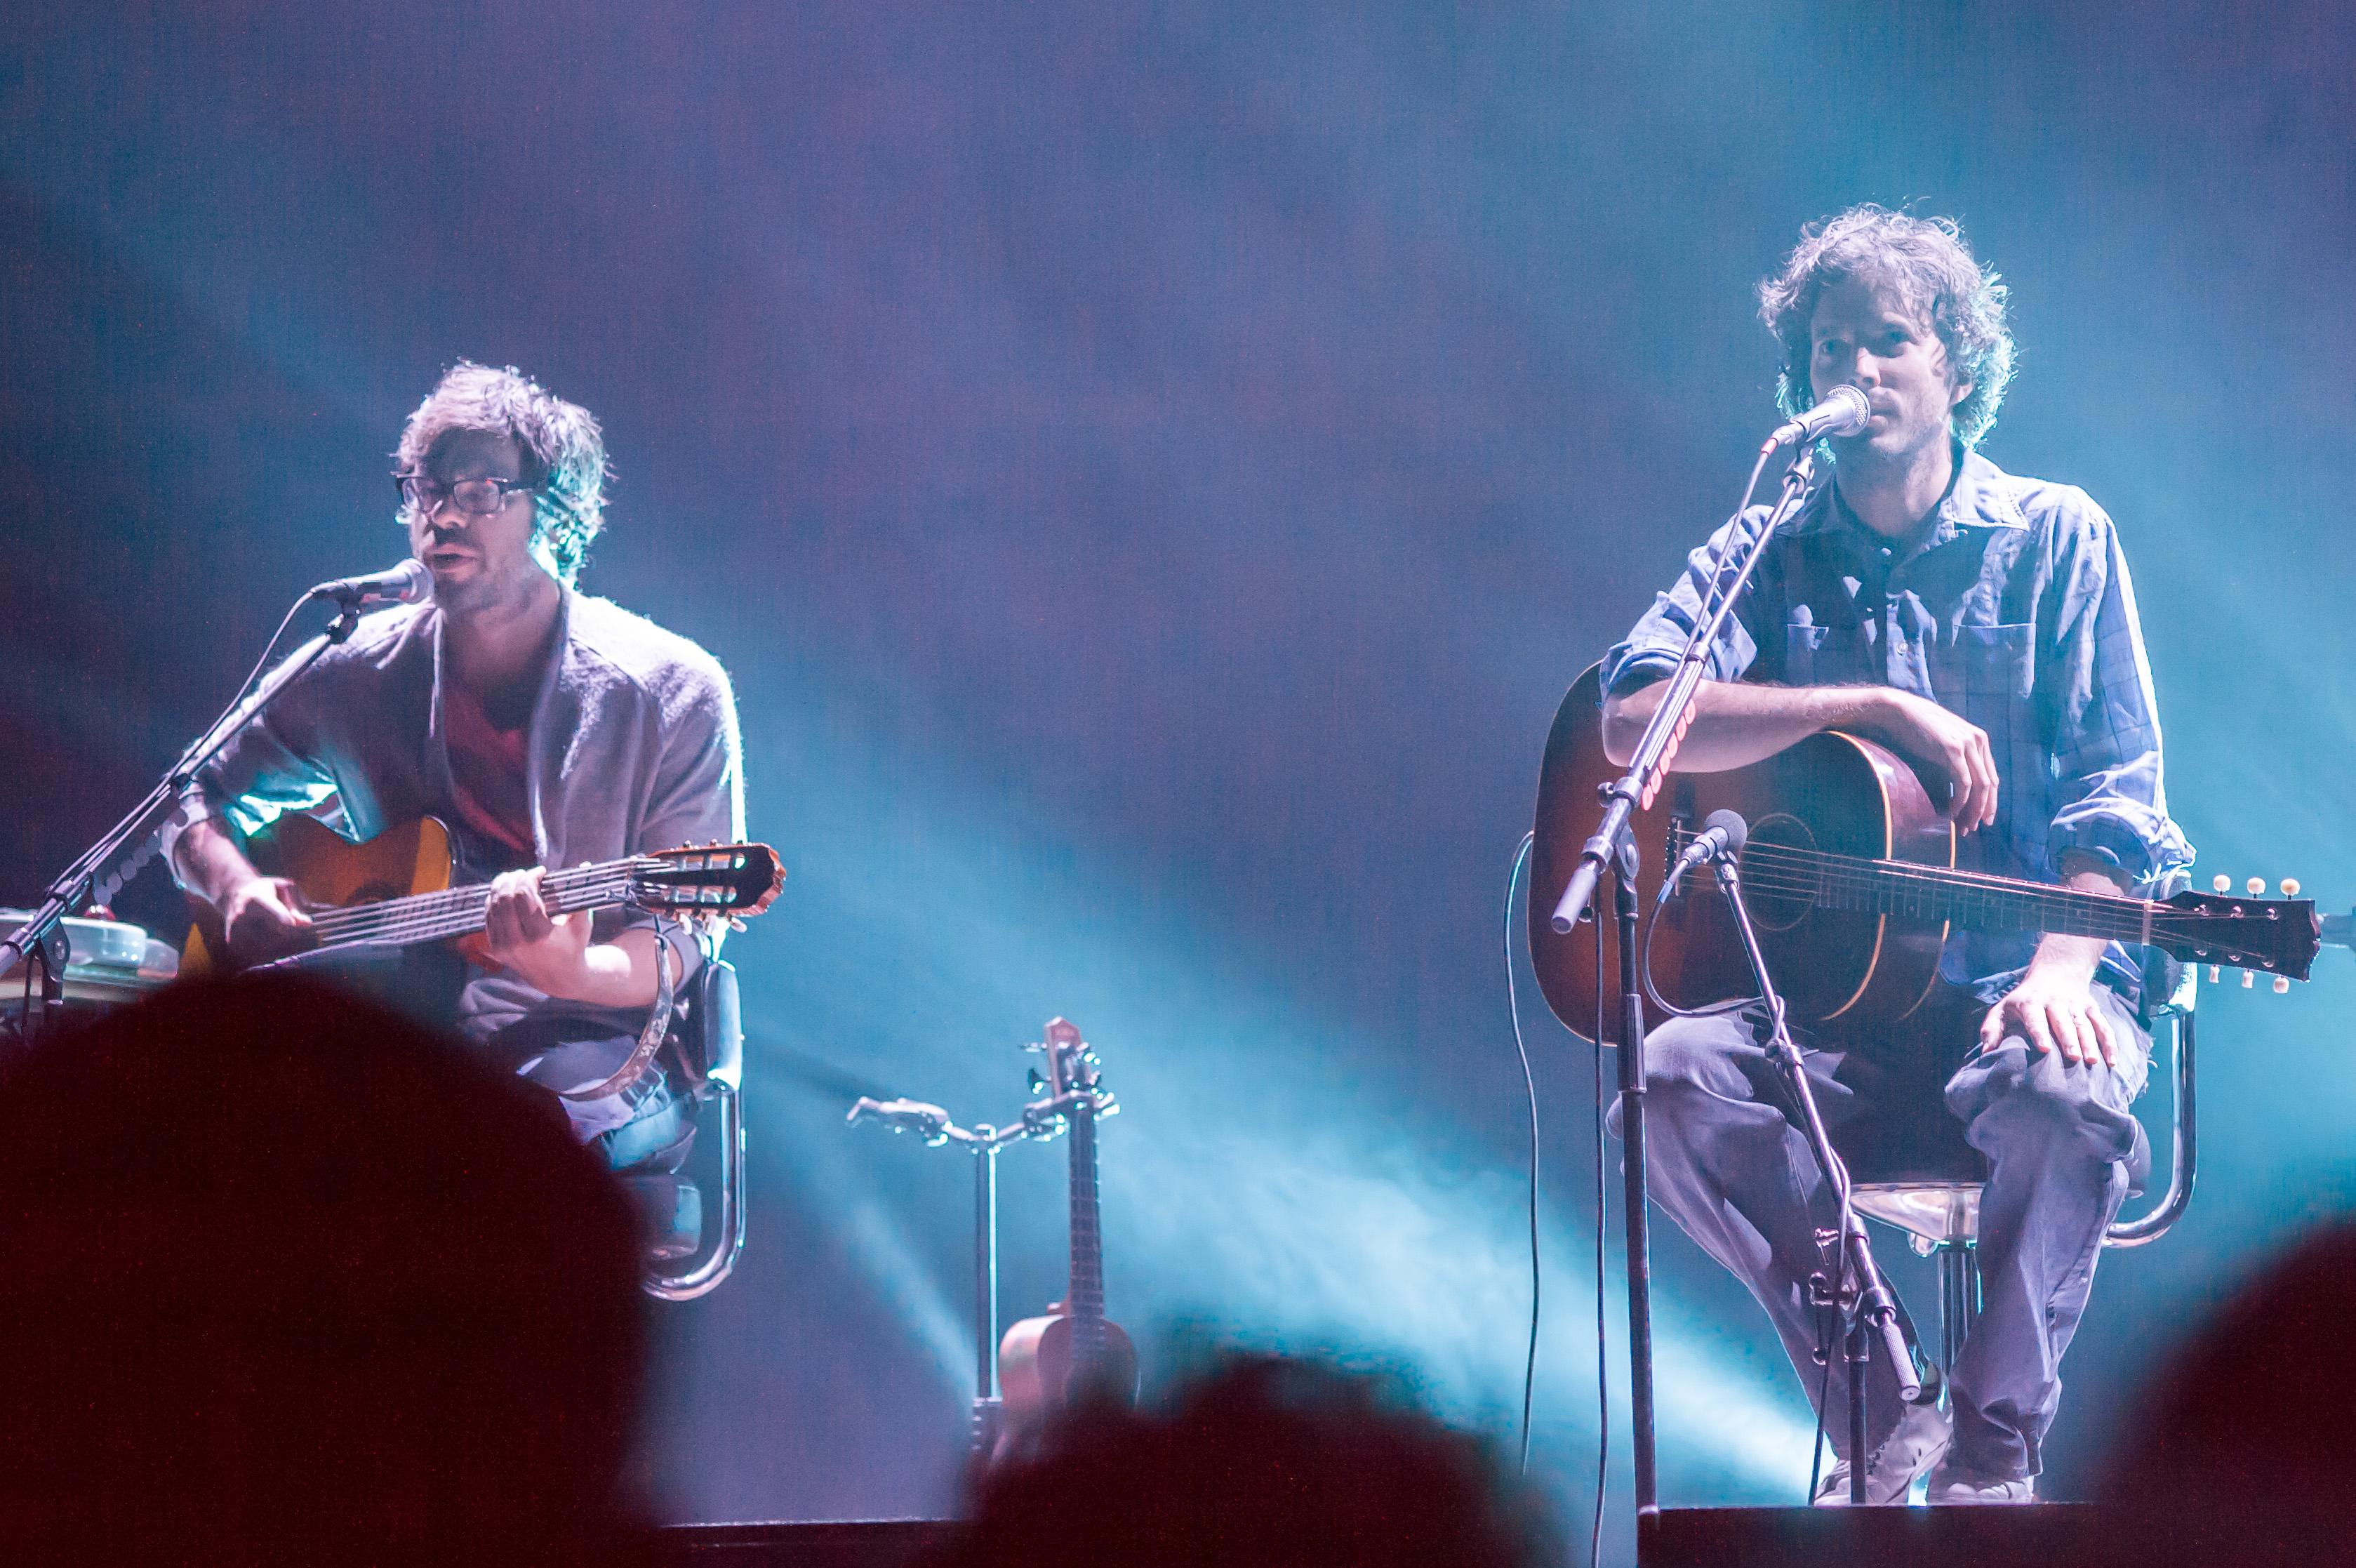 Flight Of The Conchords Guitar Chords Guitar Tabs And Lyrics Album